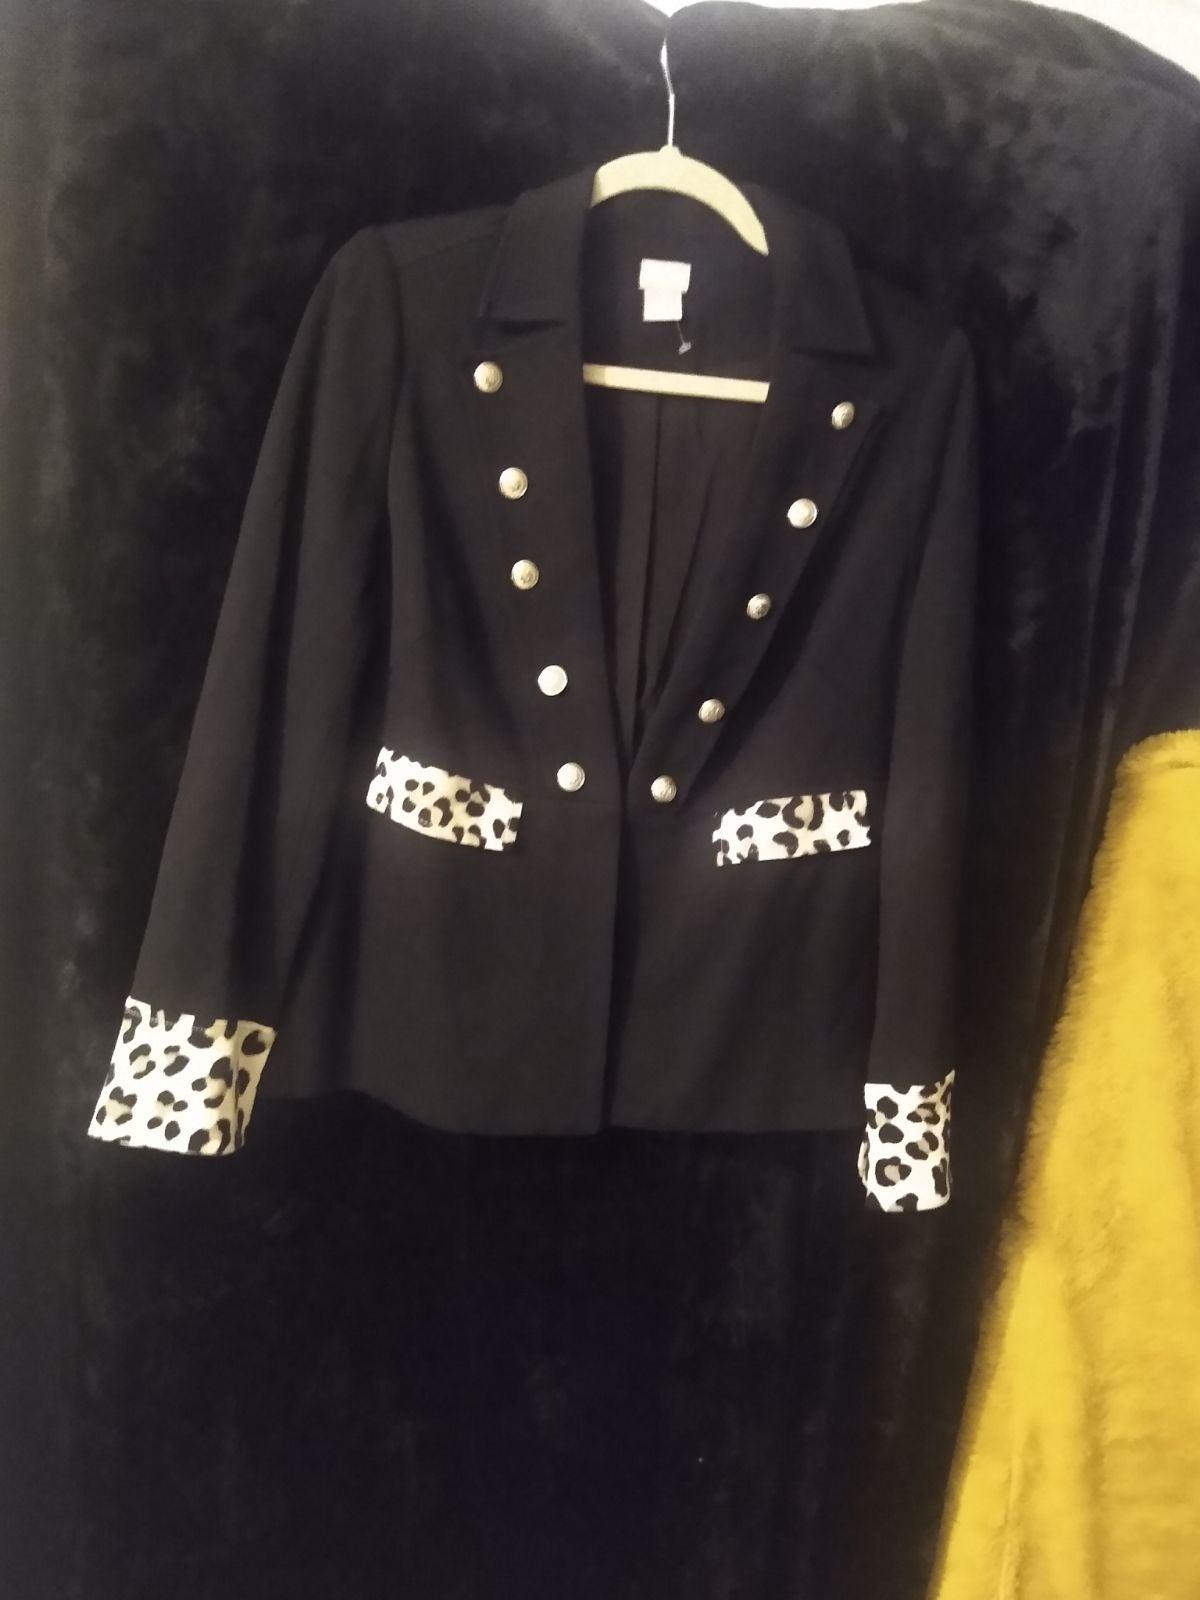 Chico's blazer